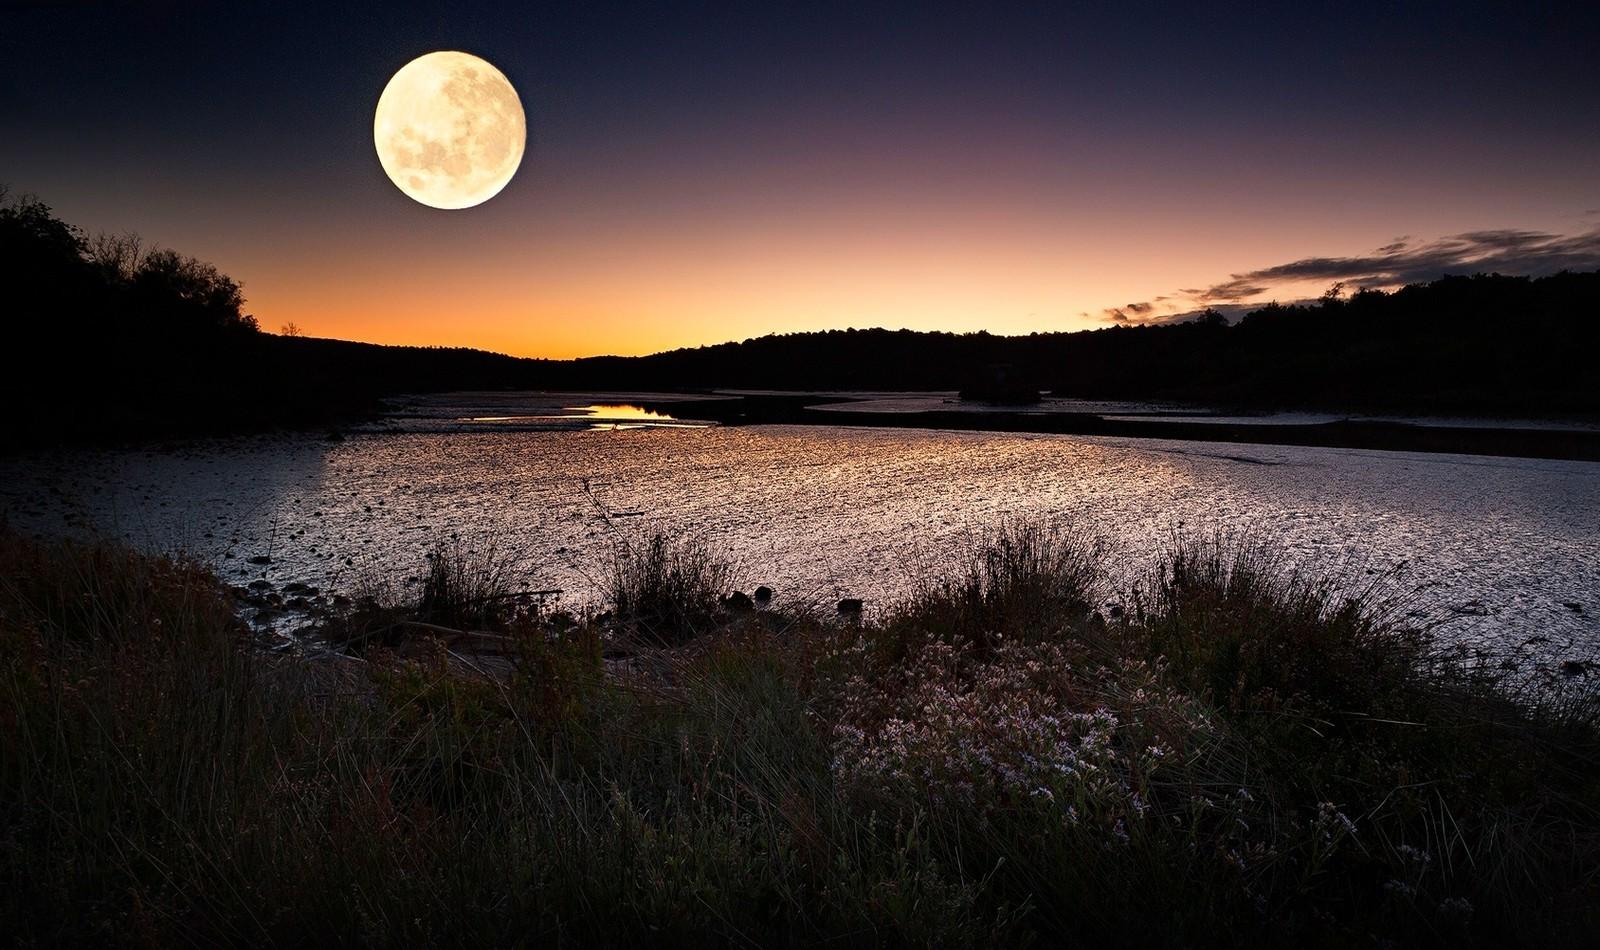 Wallpaper Sunlight Landscape Sunset Sea Night Hill Lake Nature Reflection Sky Sunrise Moon Evening Morning Coast River Sun Moonlight